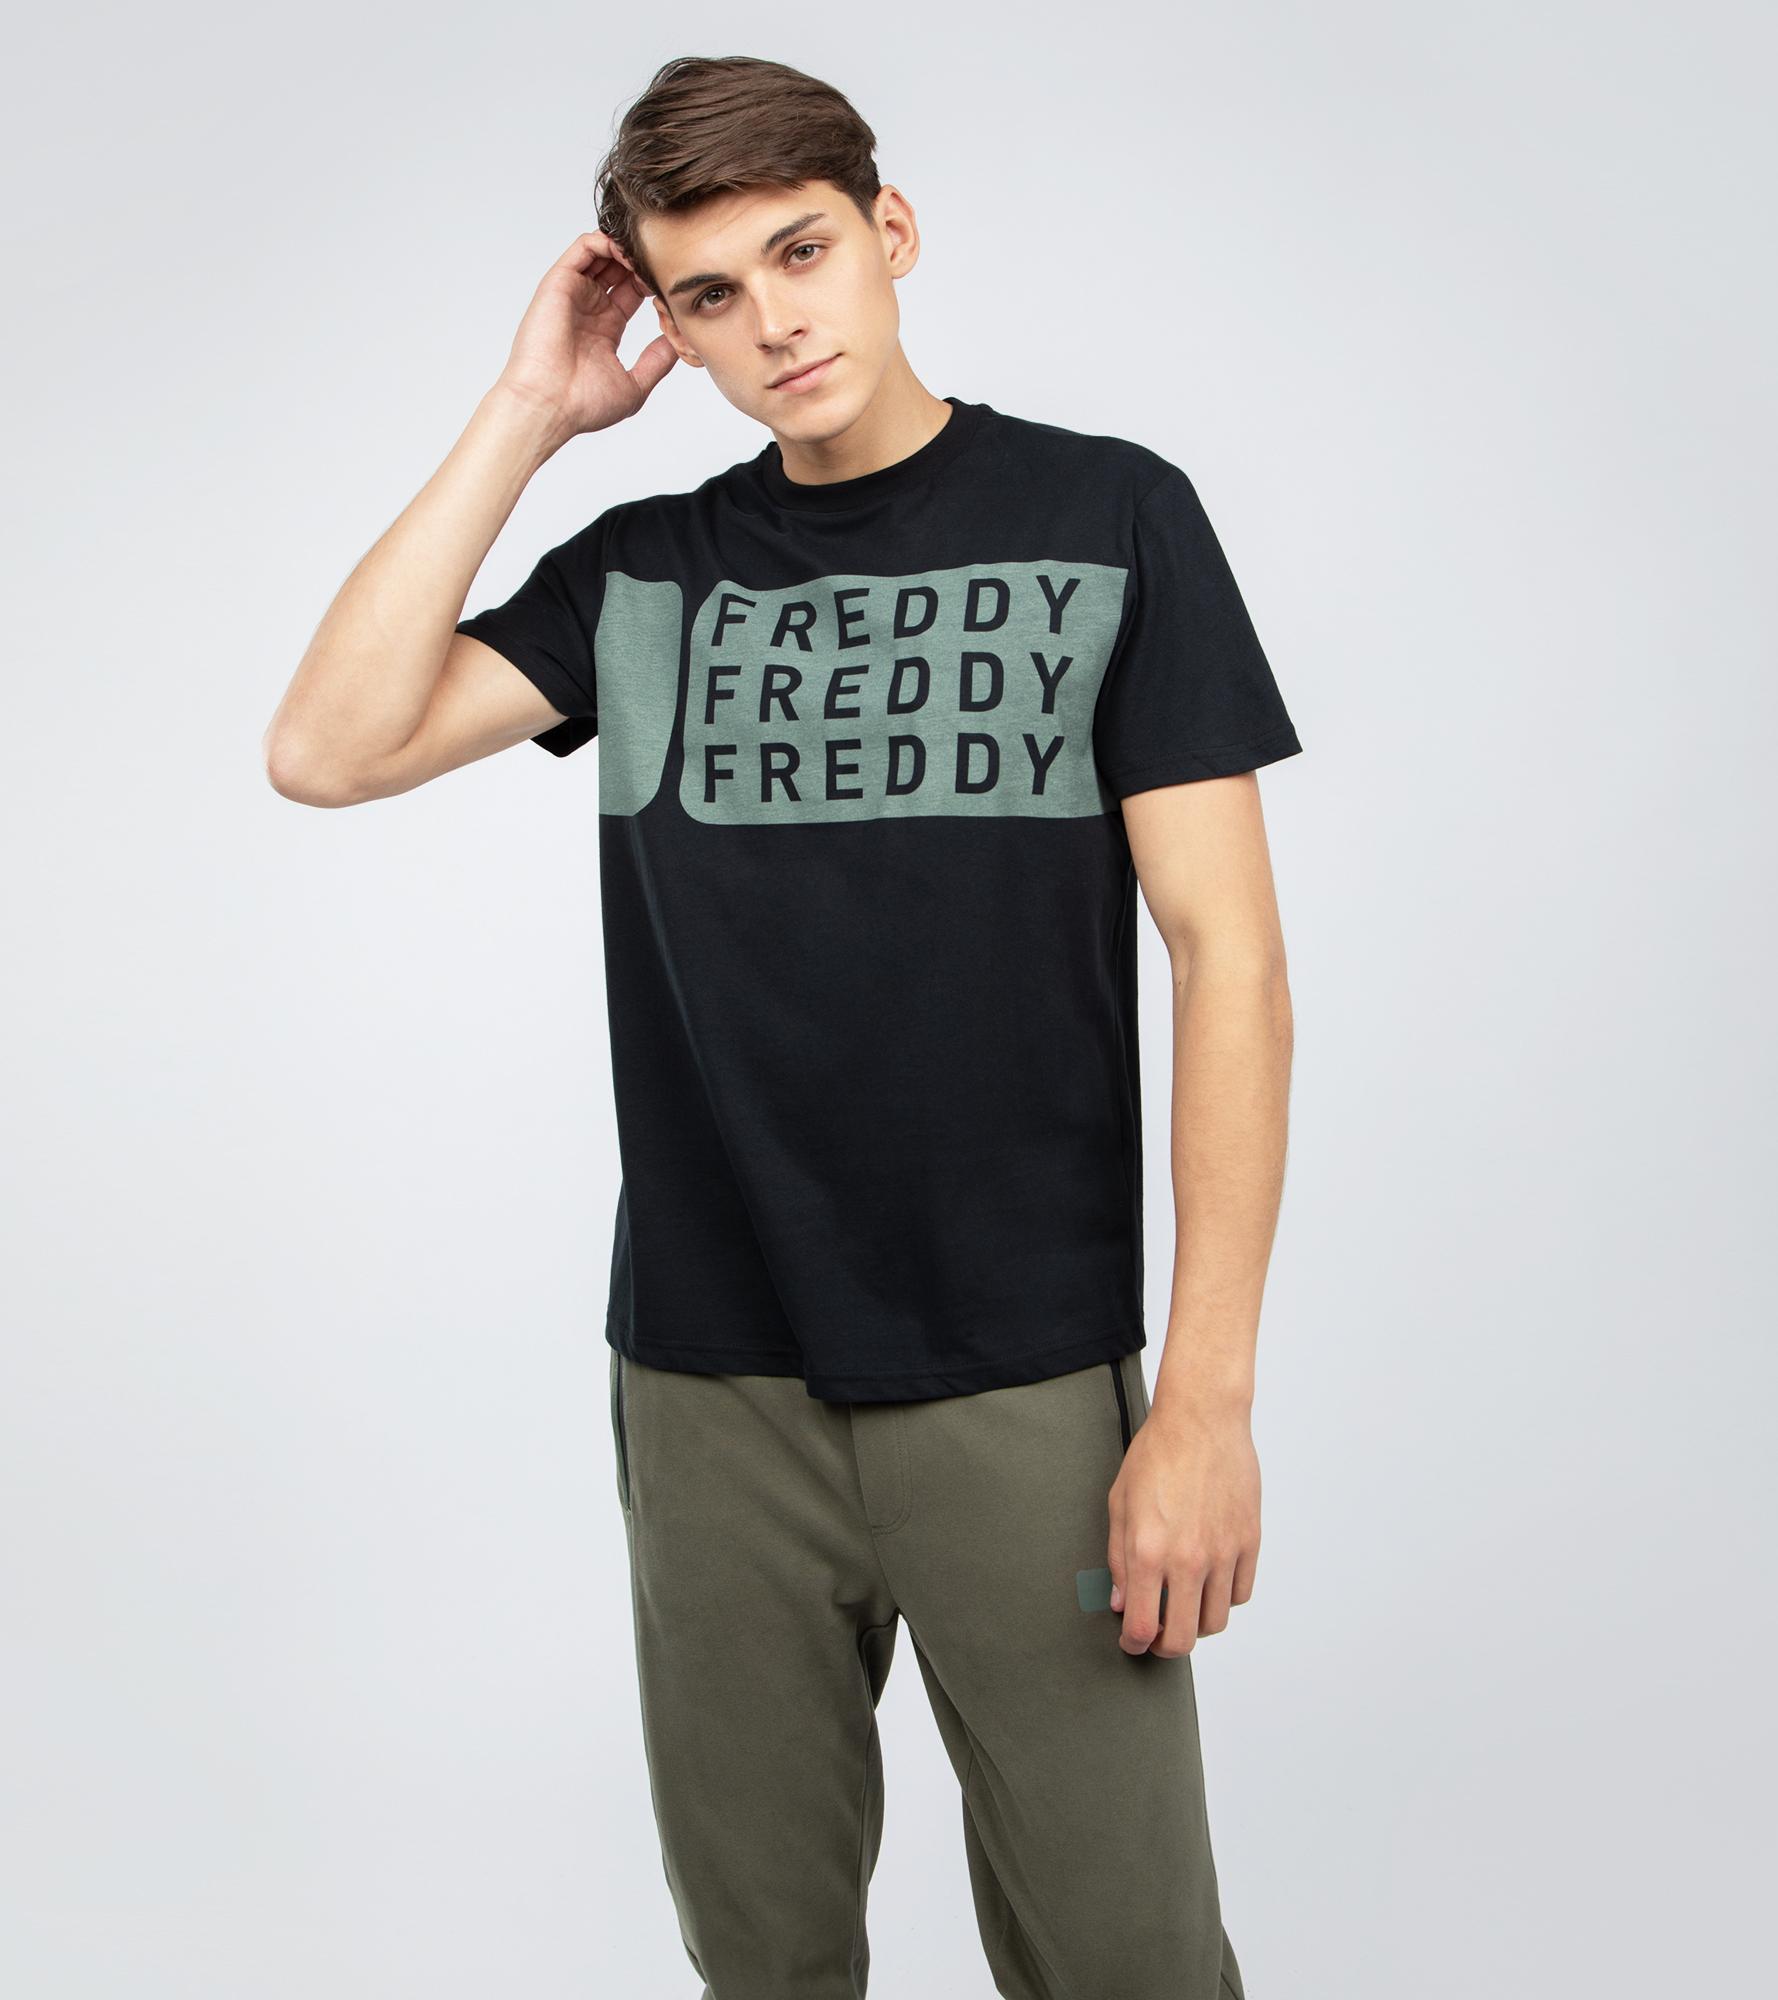 цены на Freddy Футболка мужская Freddy, размер 52-54  в интернет-магазинах